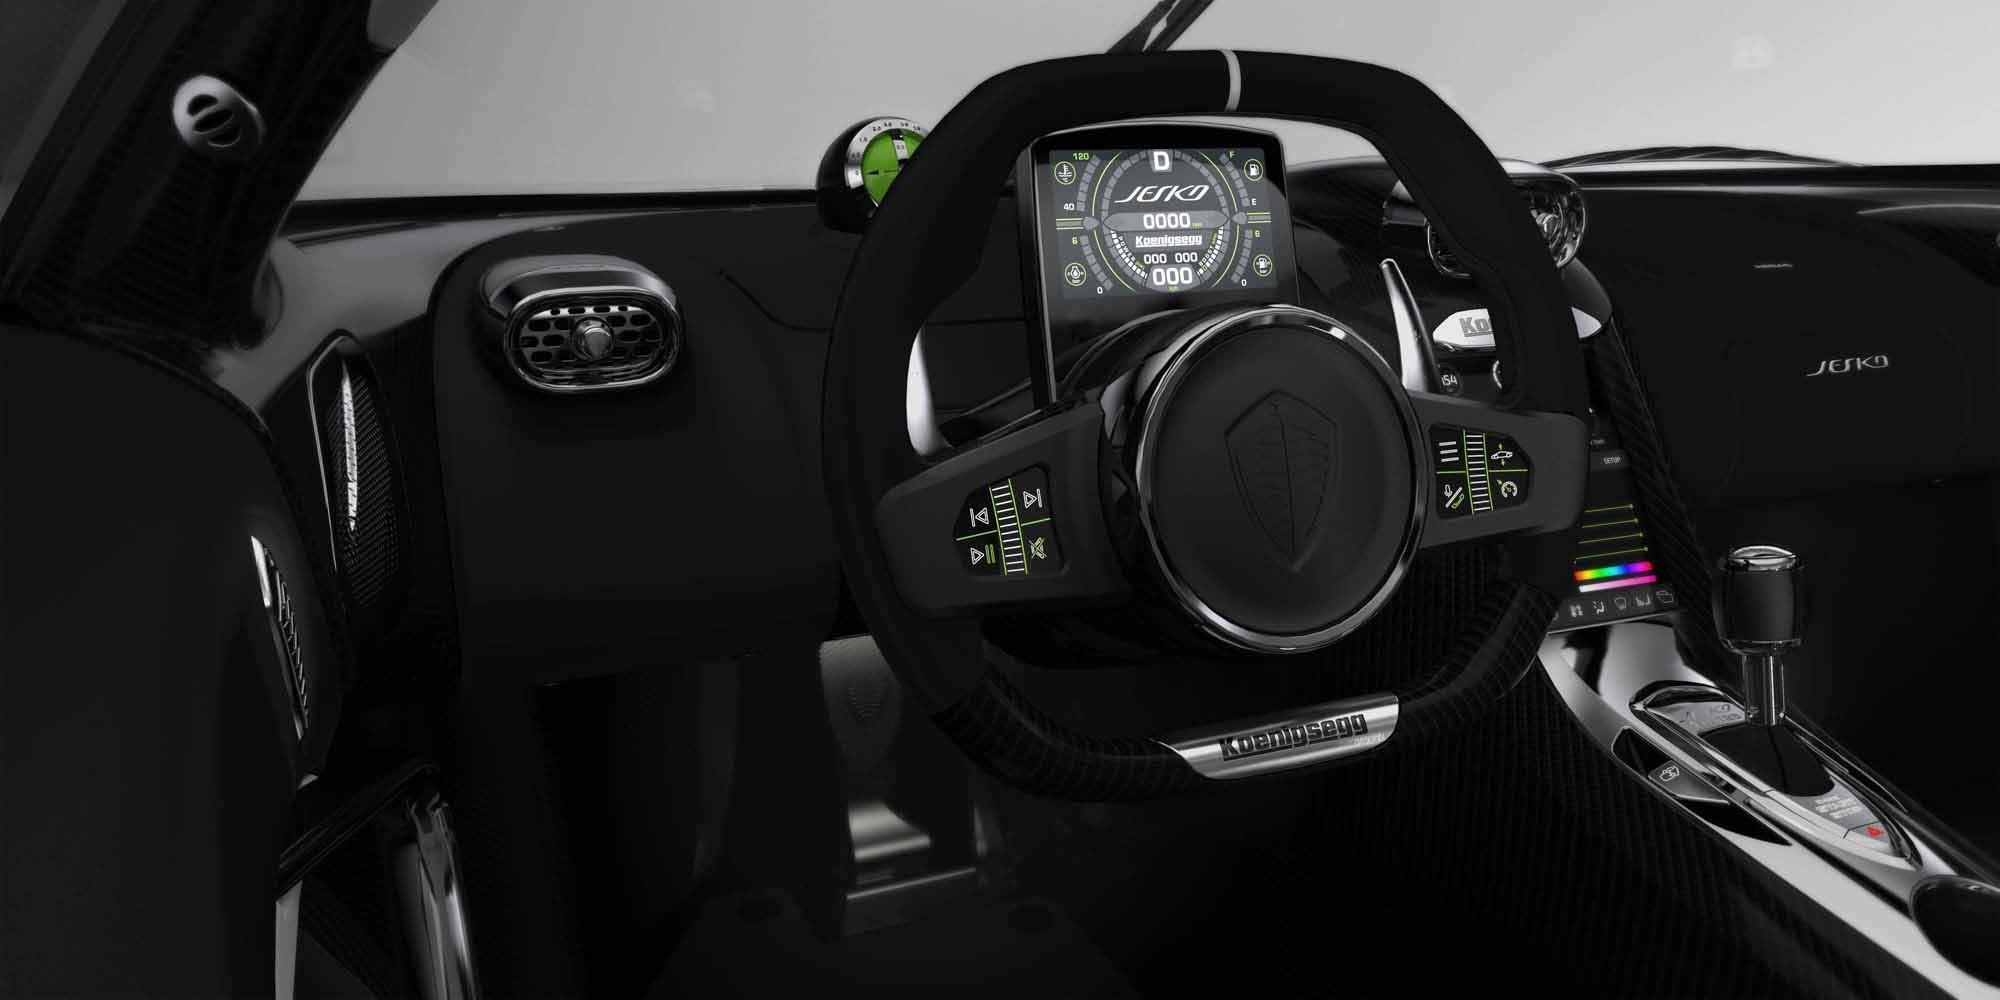 C:\Users\Jialing\Desktop\20190403\20190403\639-Car Guide\Koenigsegg Jesko - half\5c80b363ec05c47562000051.jpg